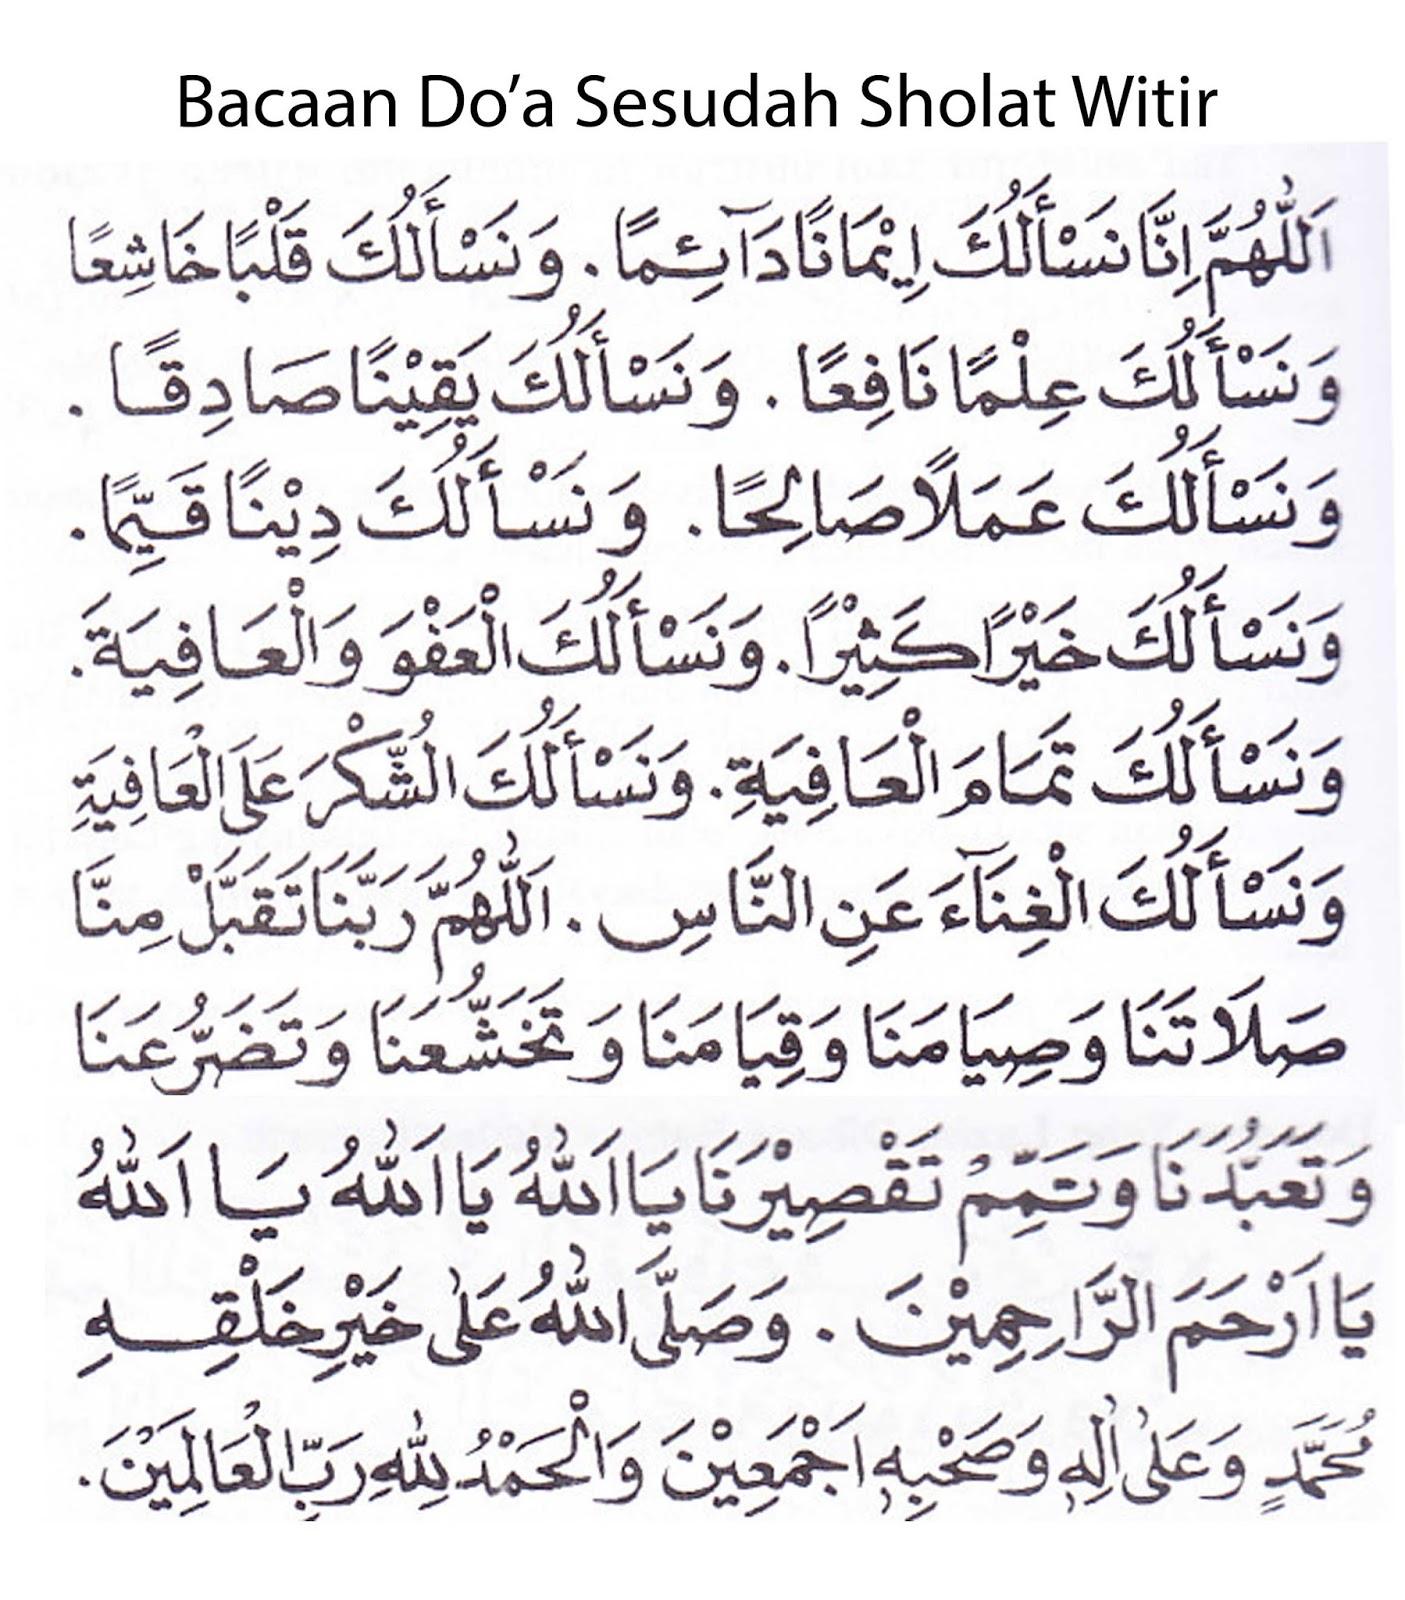 Citaten Quran Beserta Artinya : Archives